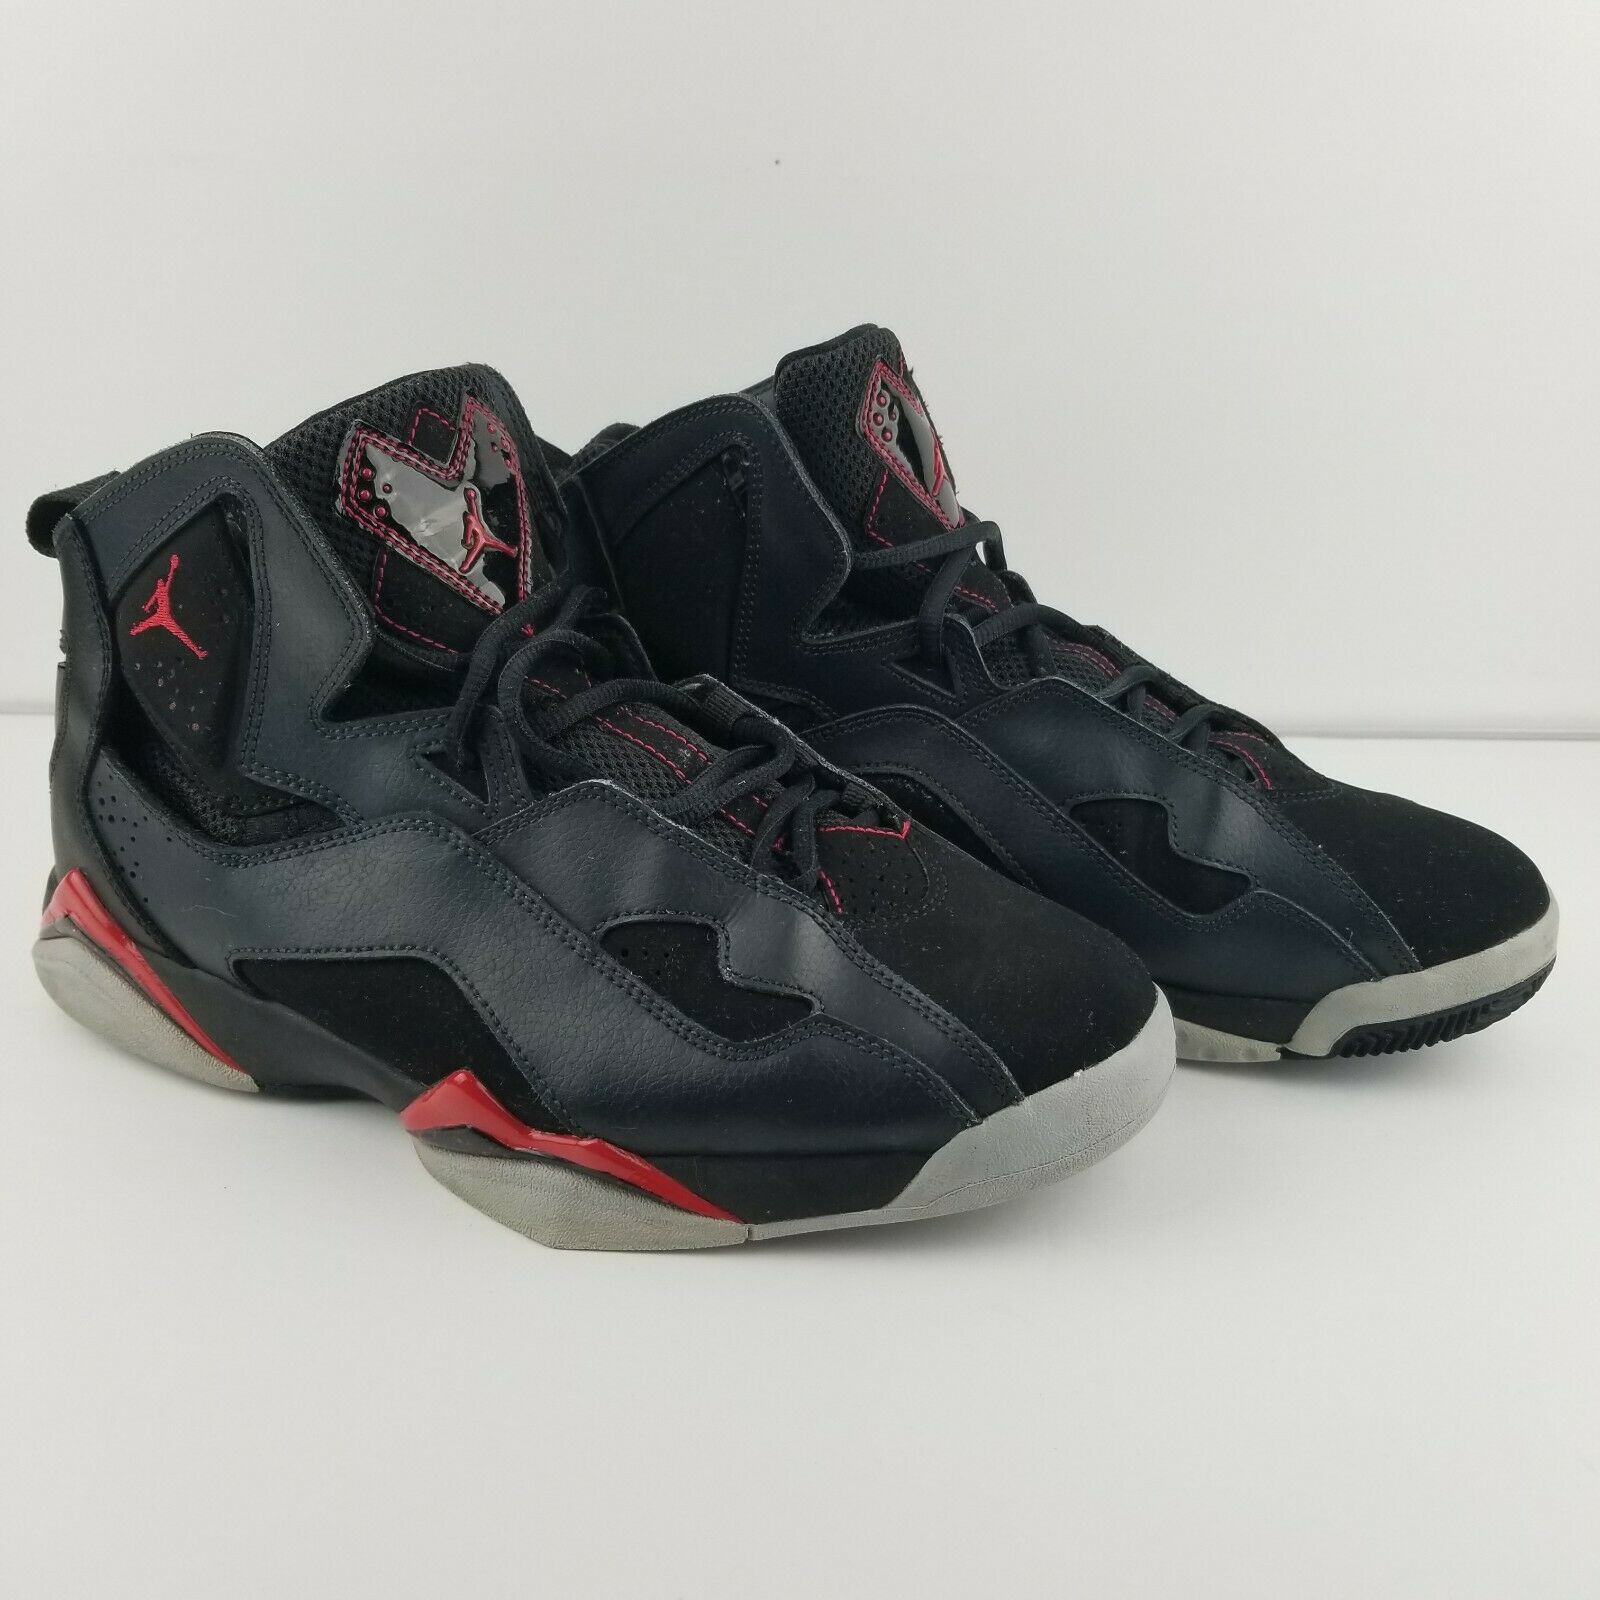 a0de4c749efe12 Nike Air Jordan Jordan Jordan True Flight Black Gym Red-Anthracite 342964-002  Size